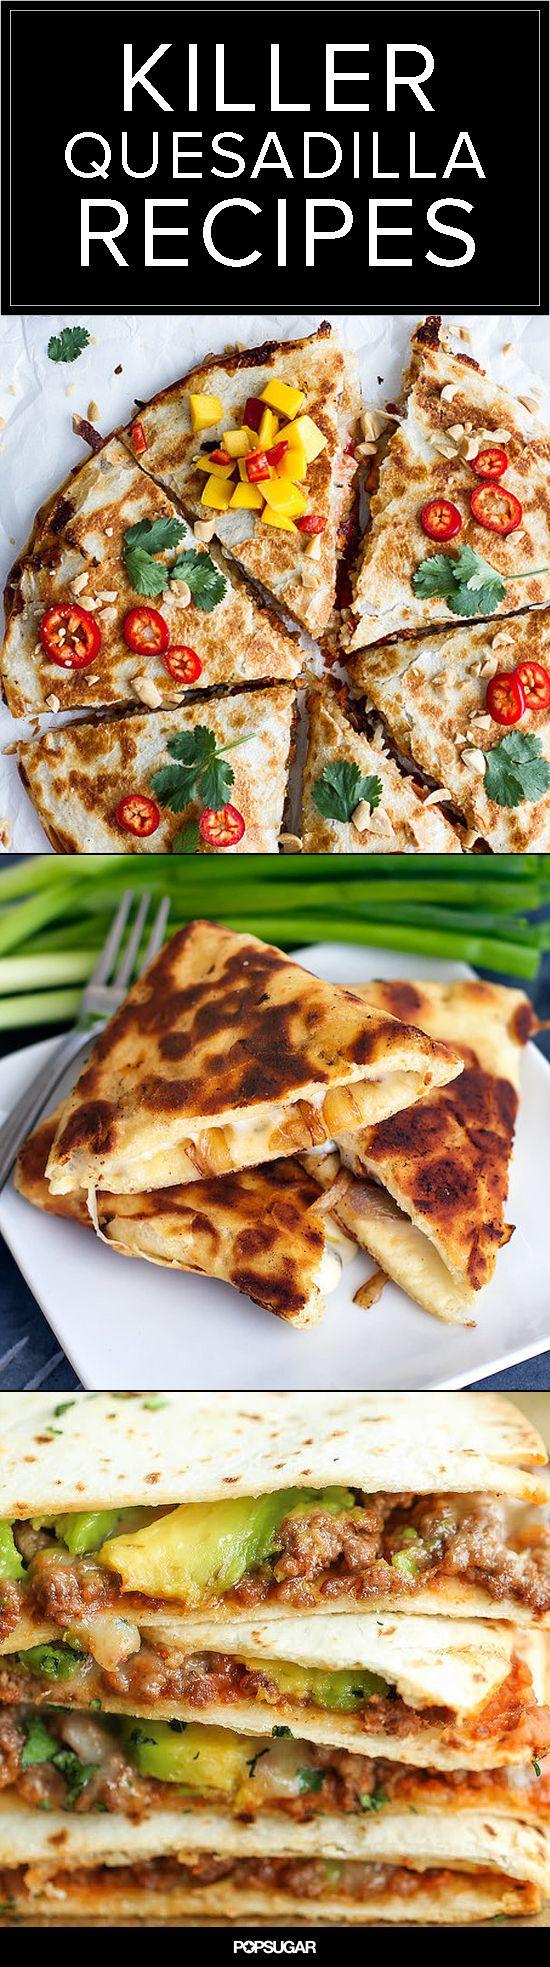 Quesadilla Recipes Like You've Never Seen Before